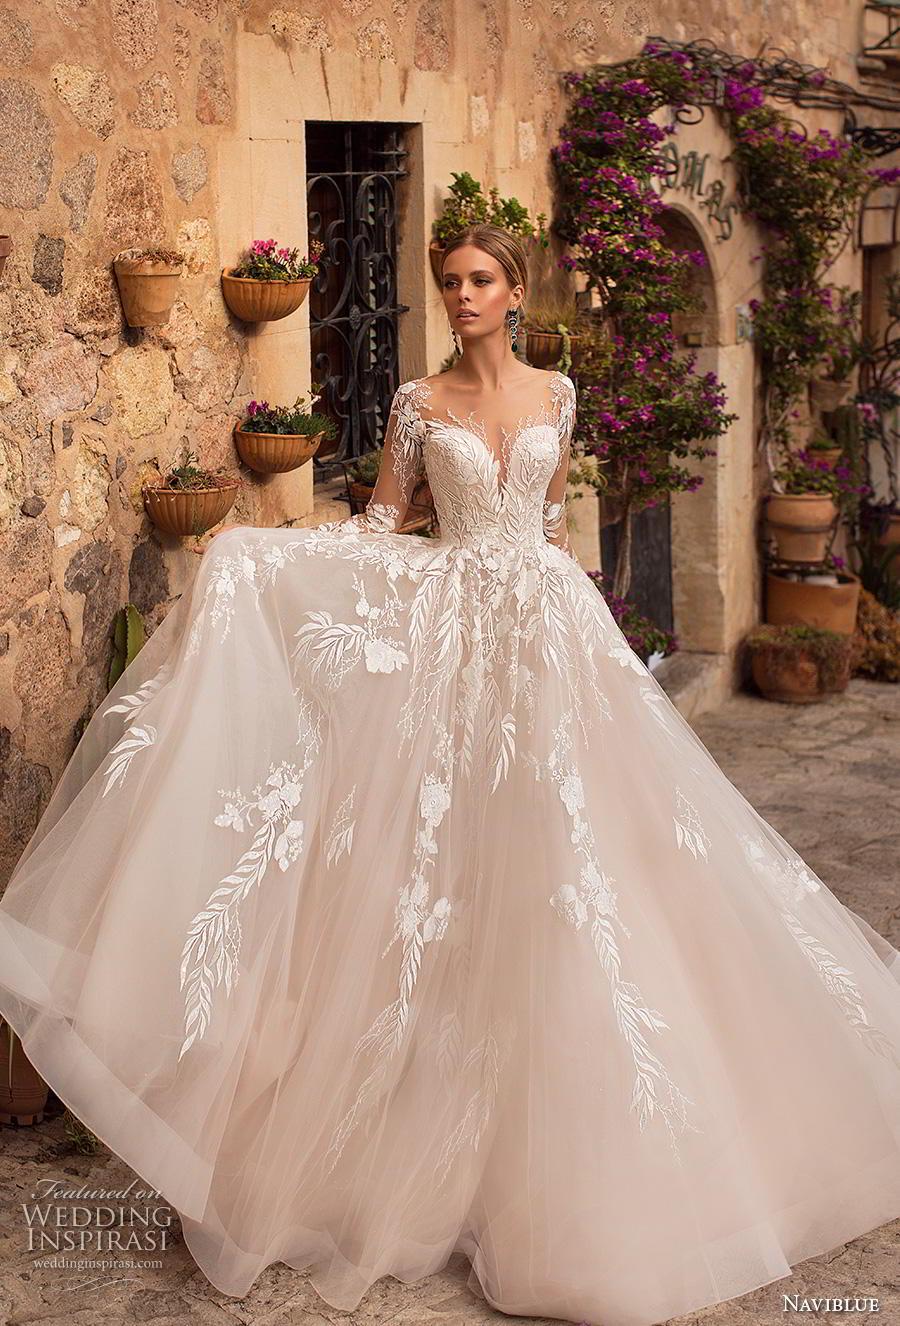 naviblue 2019 bridal long sleeves deep sweetheart neckline heavily embellished bodice romantic glamorous blush a line wedding dress sheer button back chapel train (13) mv